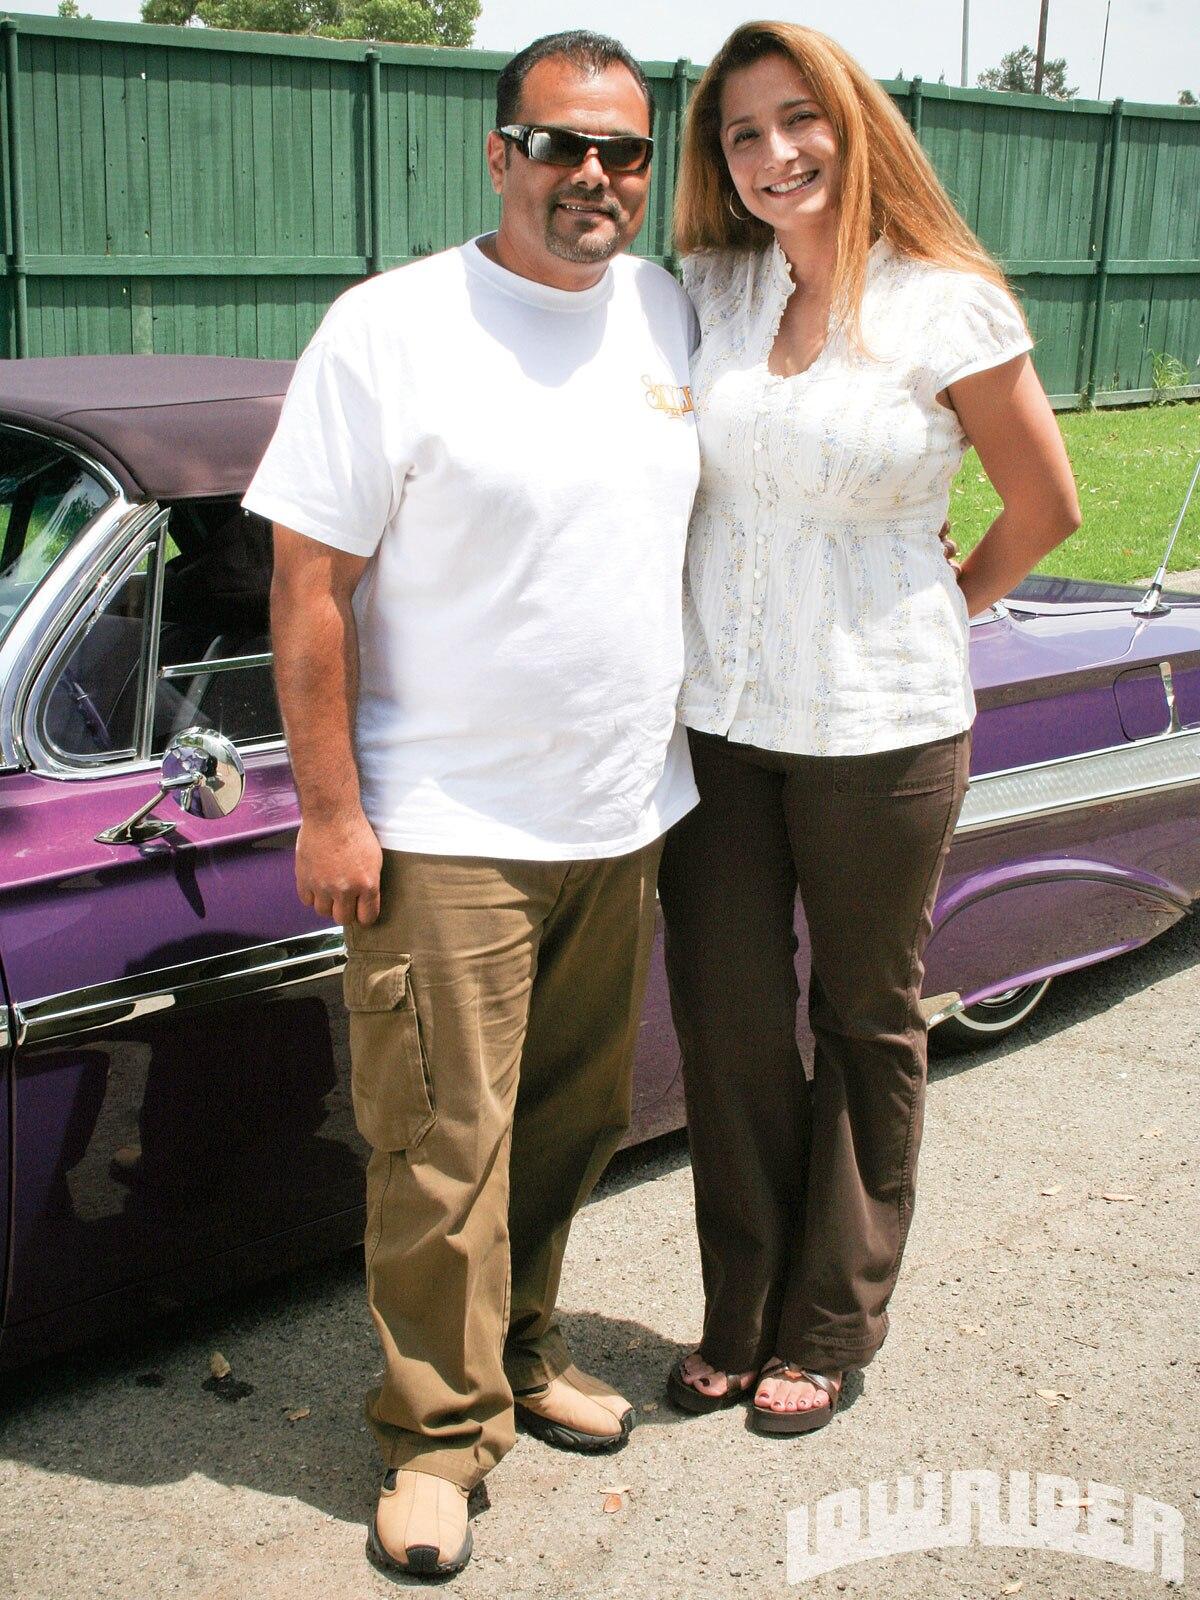 '61 Impala convertible - Danny Ayala